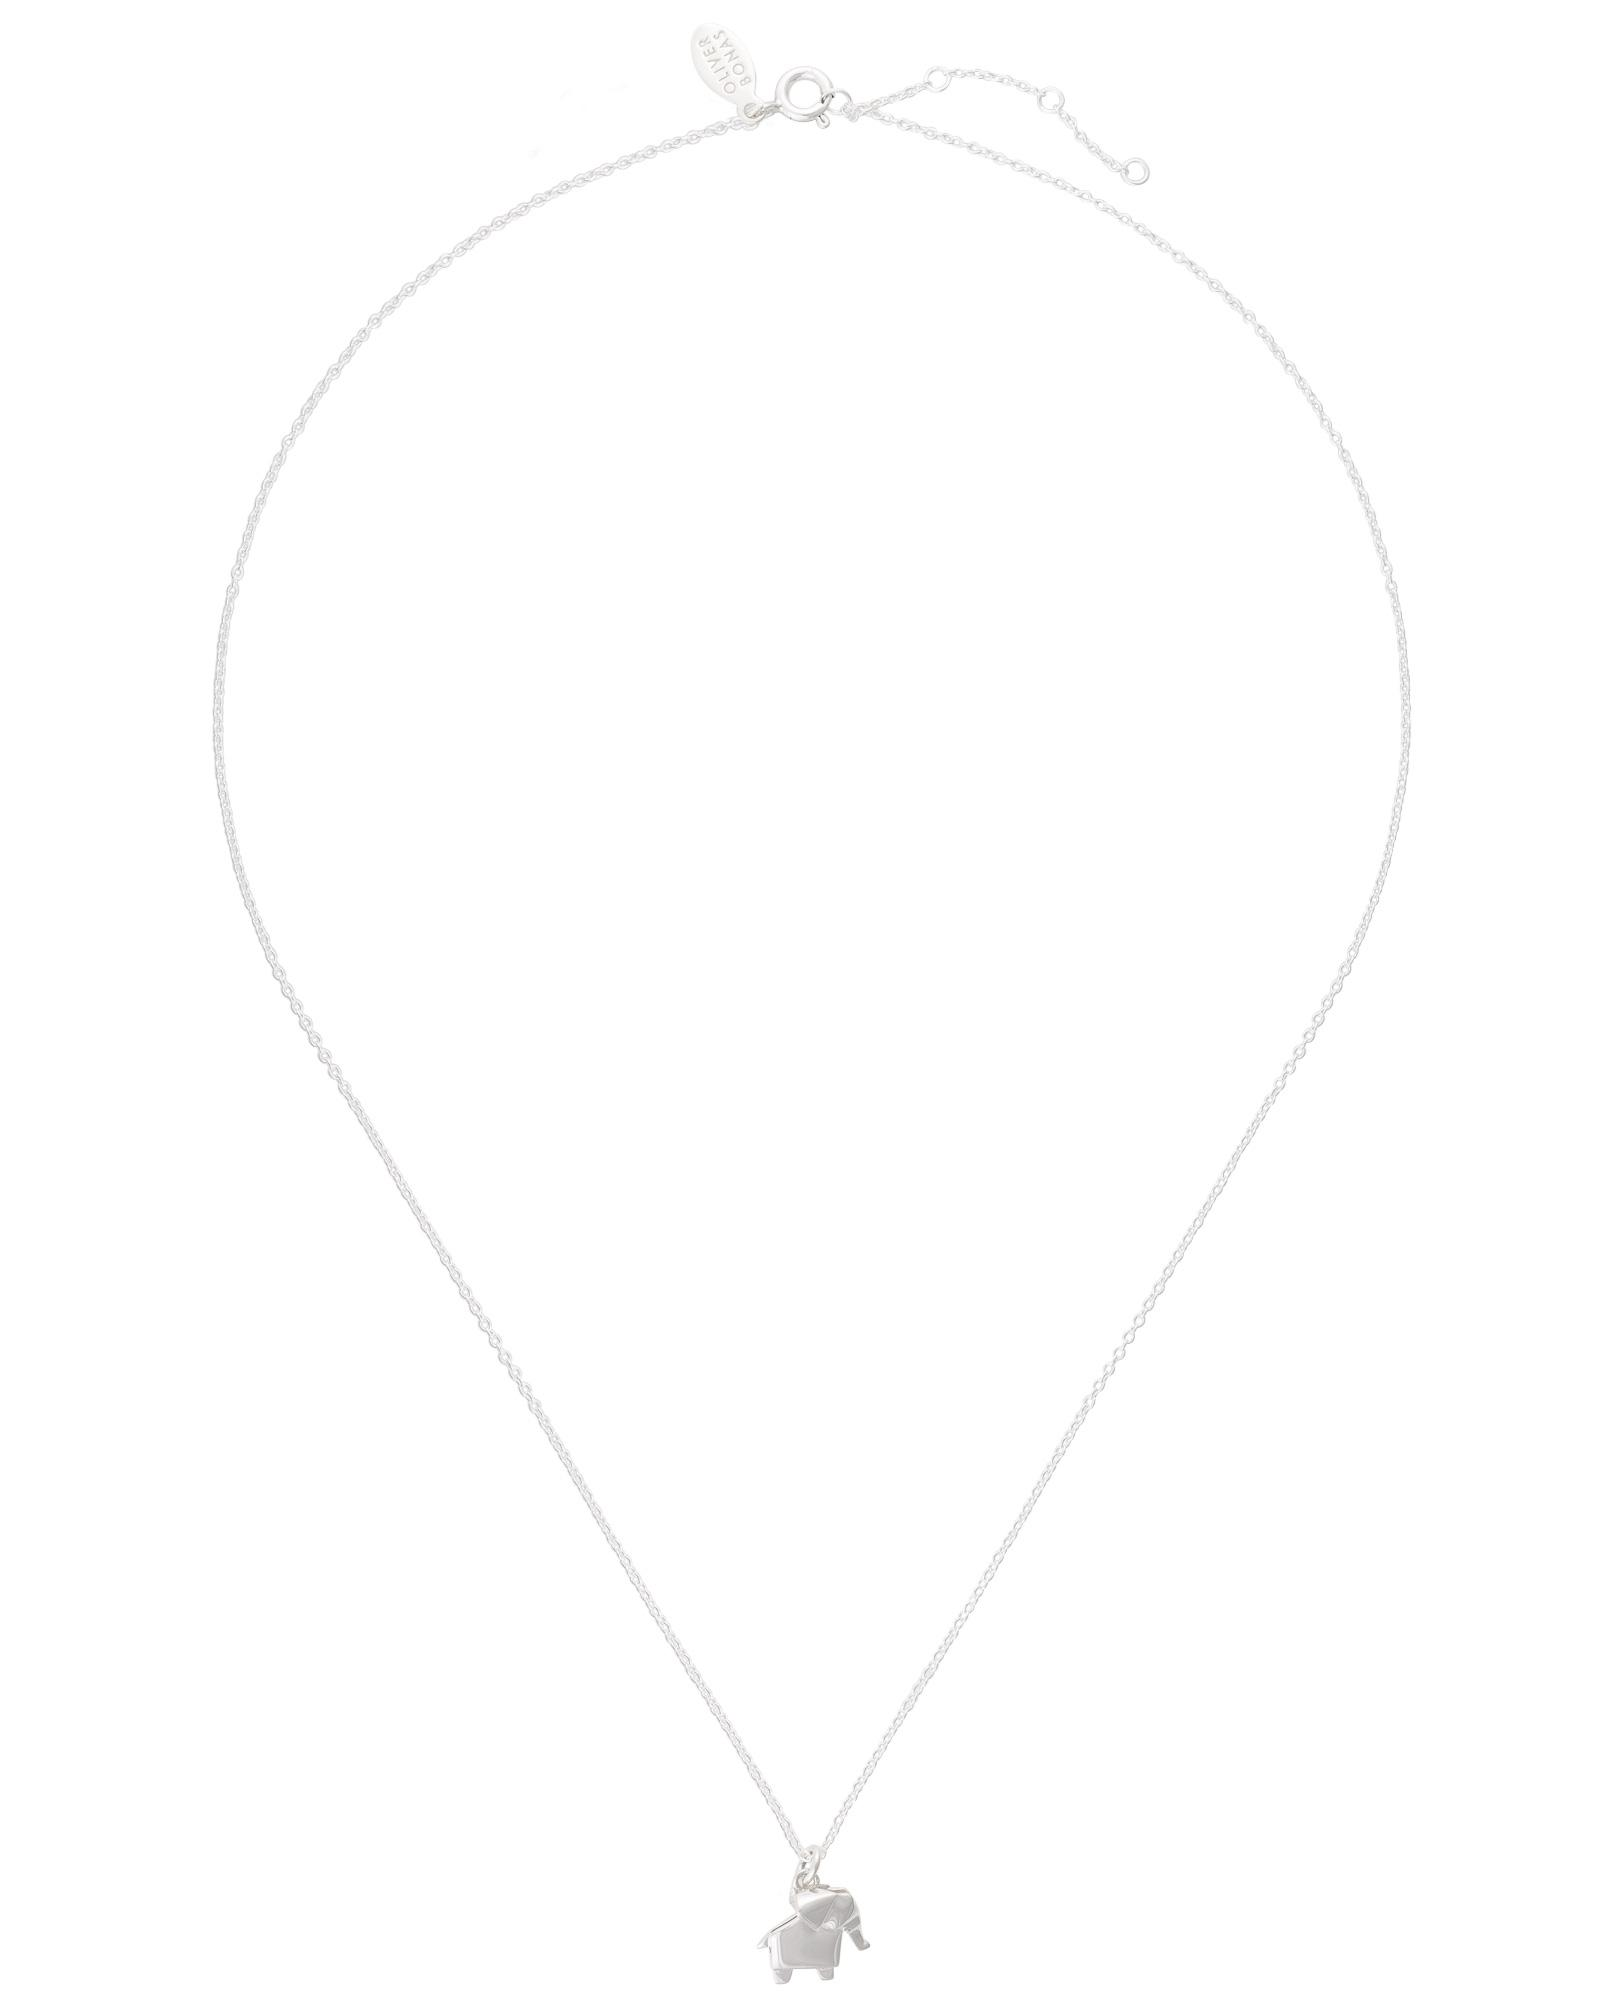 Oliver Bonas Silver Origami Elephant Necklace in Metallic